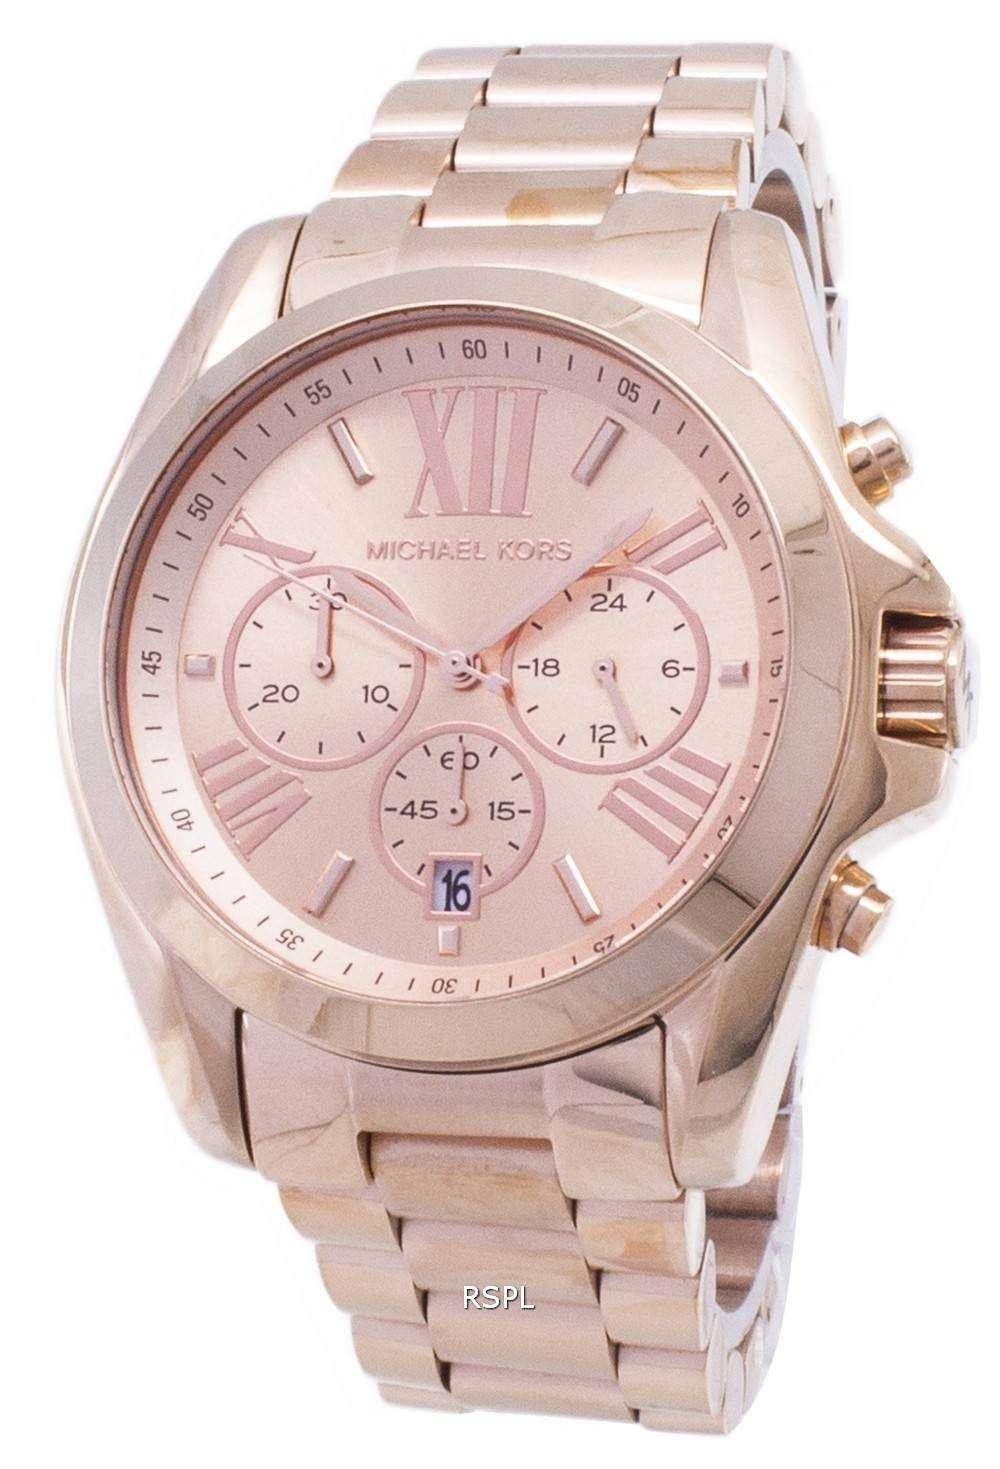 16345c747eee8 Michael Kors Bradshaw Chronograph Rose Gold-tone MK5503 Womens Watch